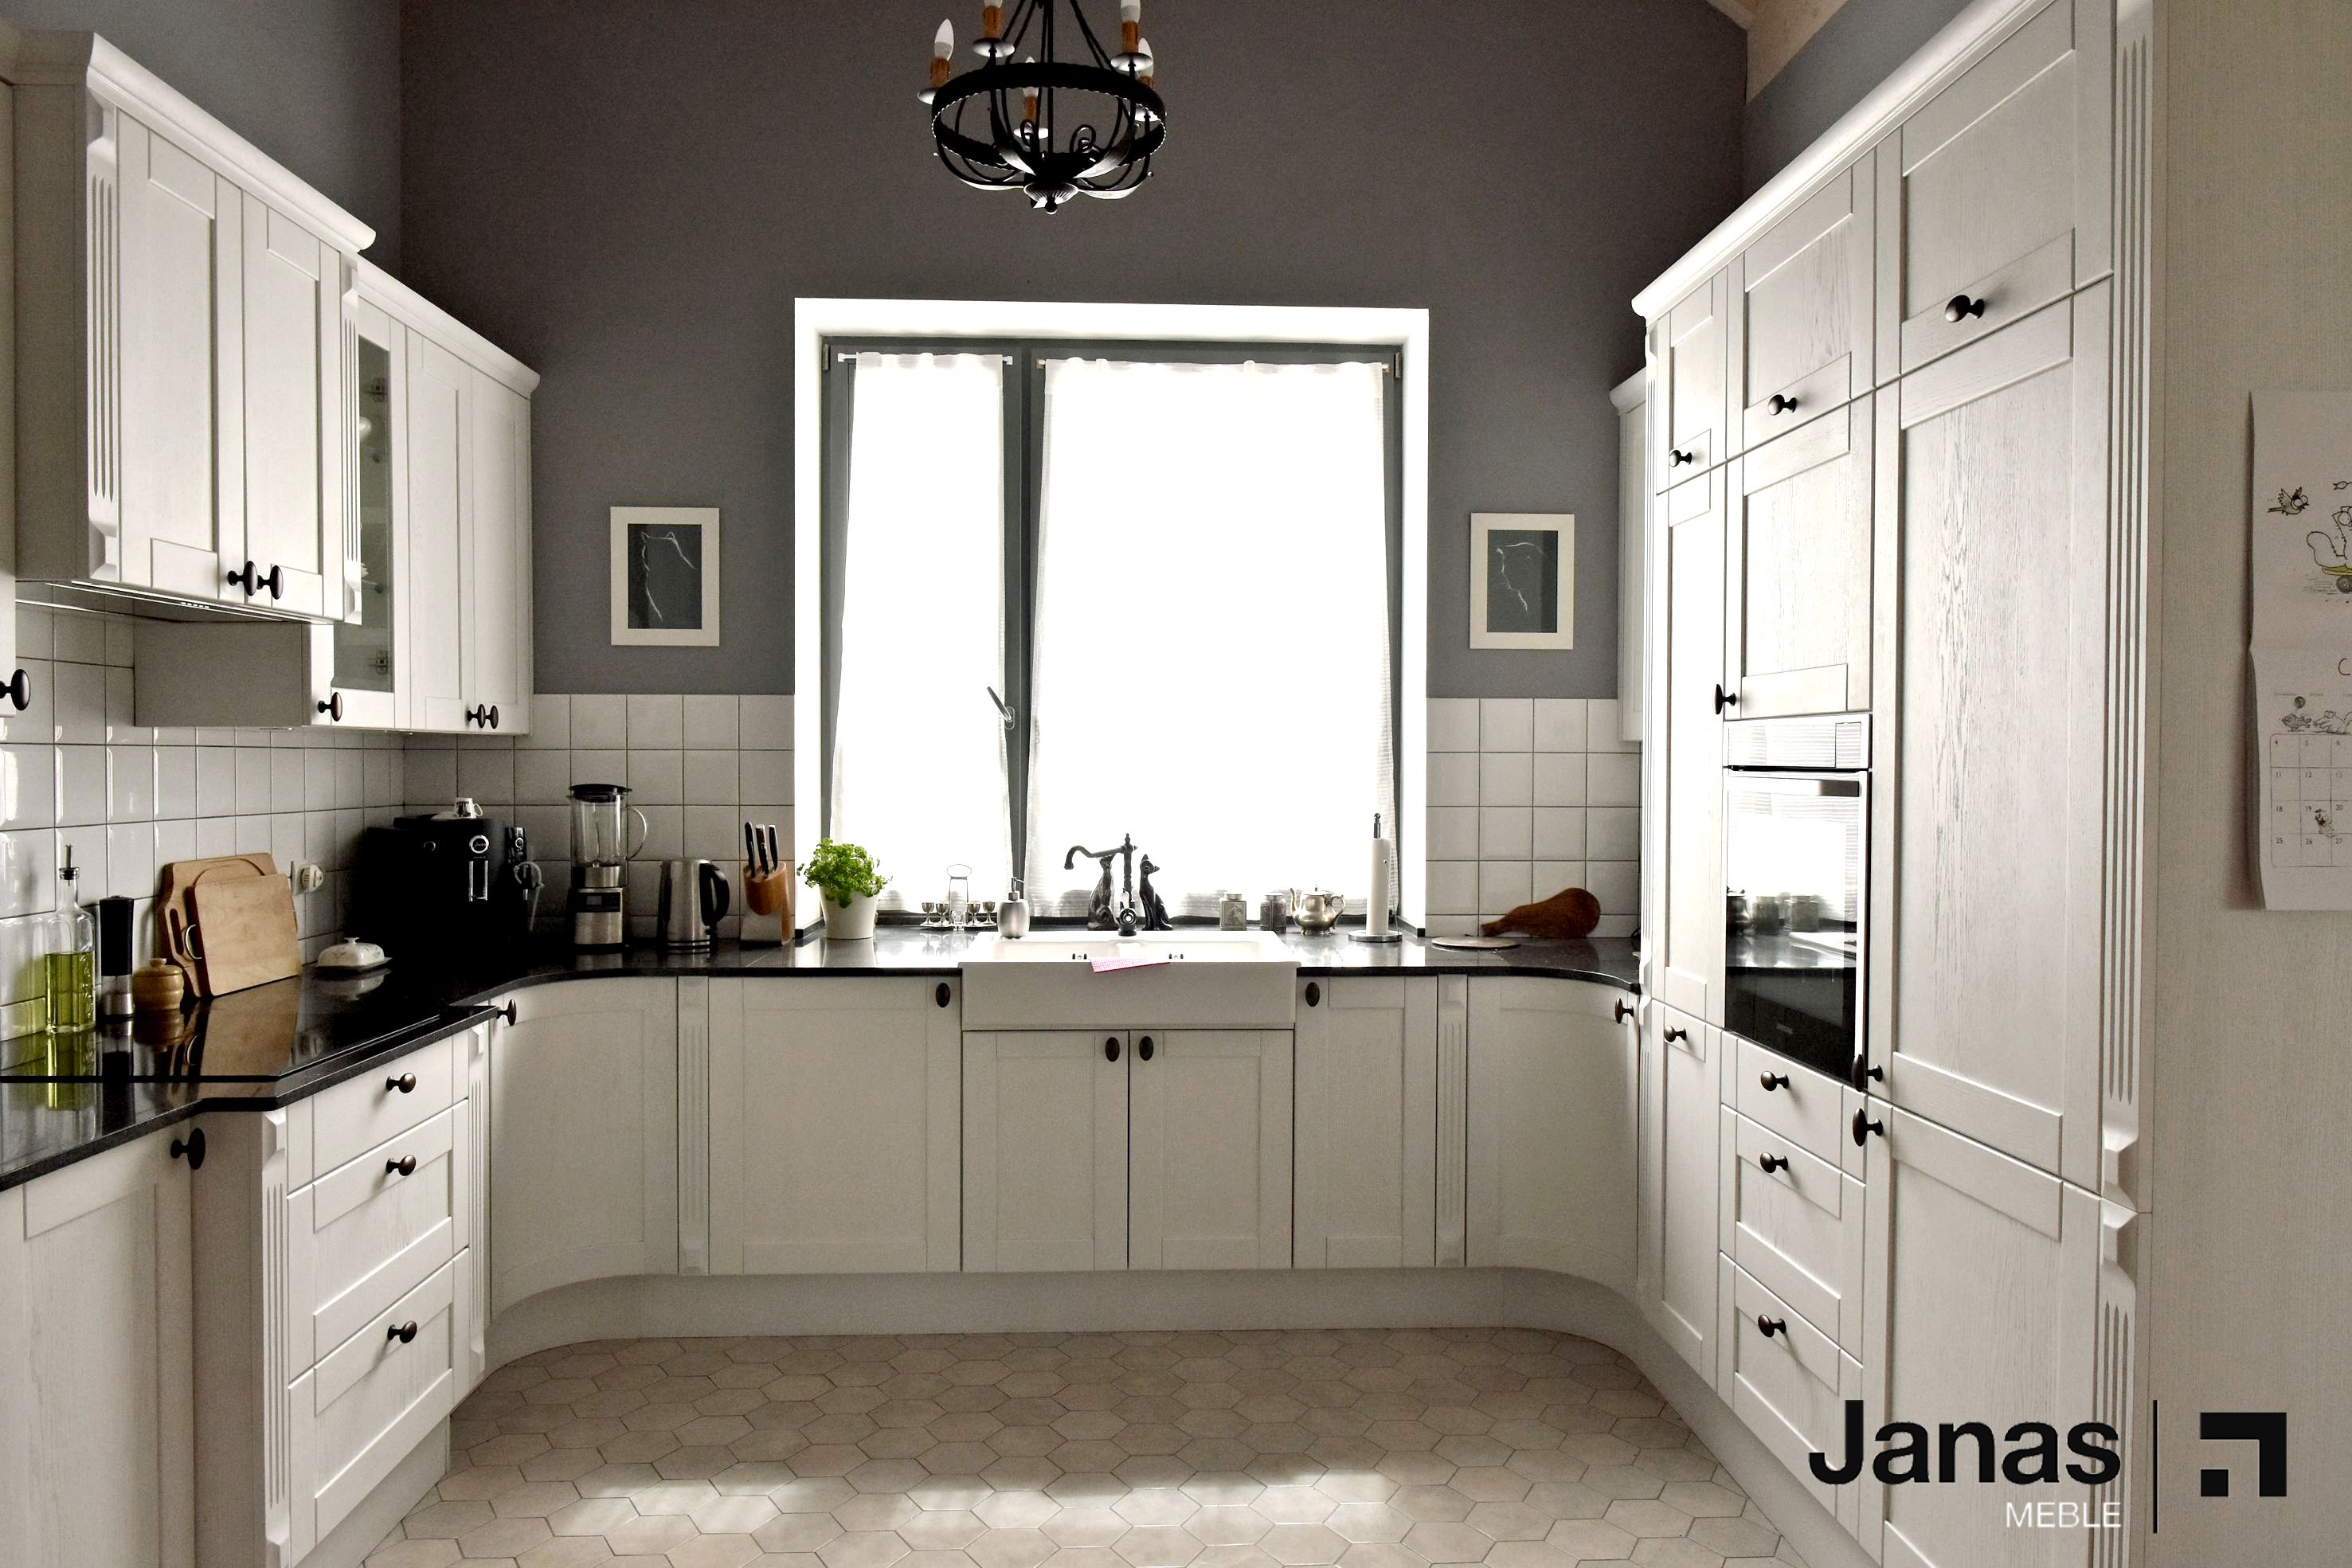 Kuchnia Na Wymiar Wroclaw Meble Kuchenne Na Wymiar Mebleml Home Decor Furniture Decor